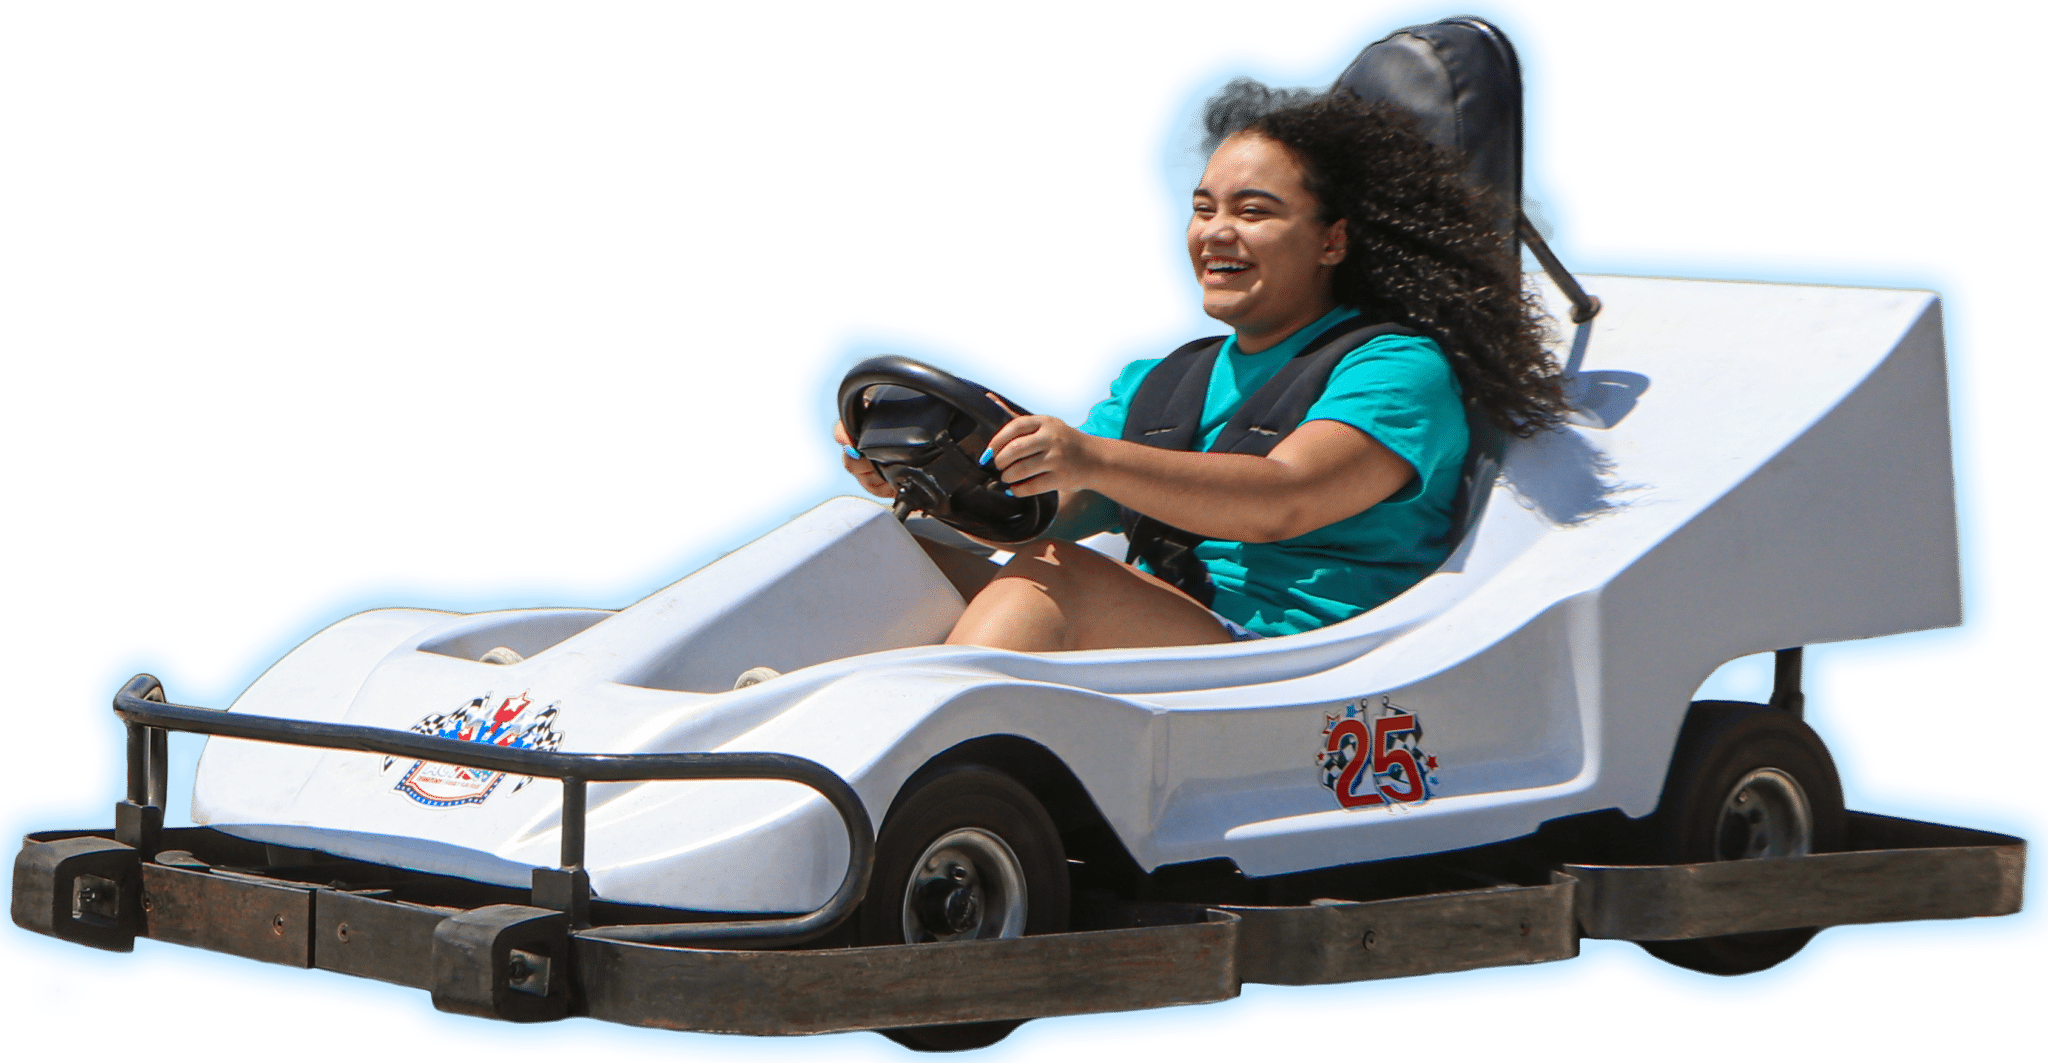 go carts in kenosha, kenosha go cart racing, kenosha go kart racing